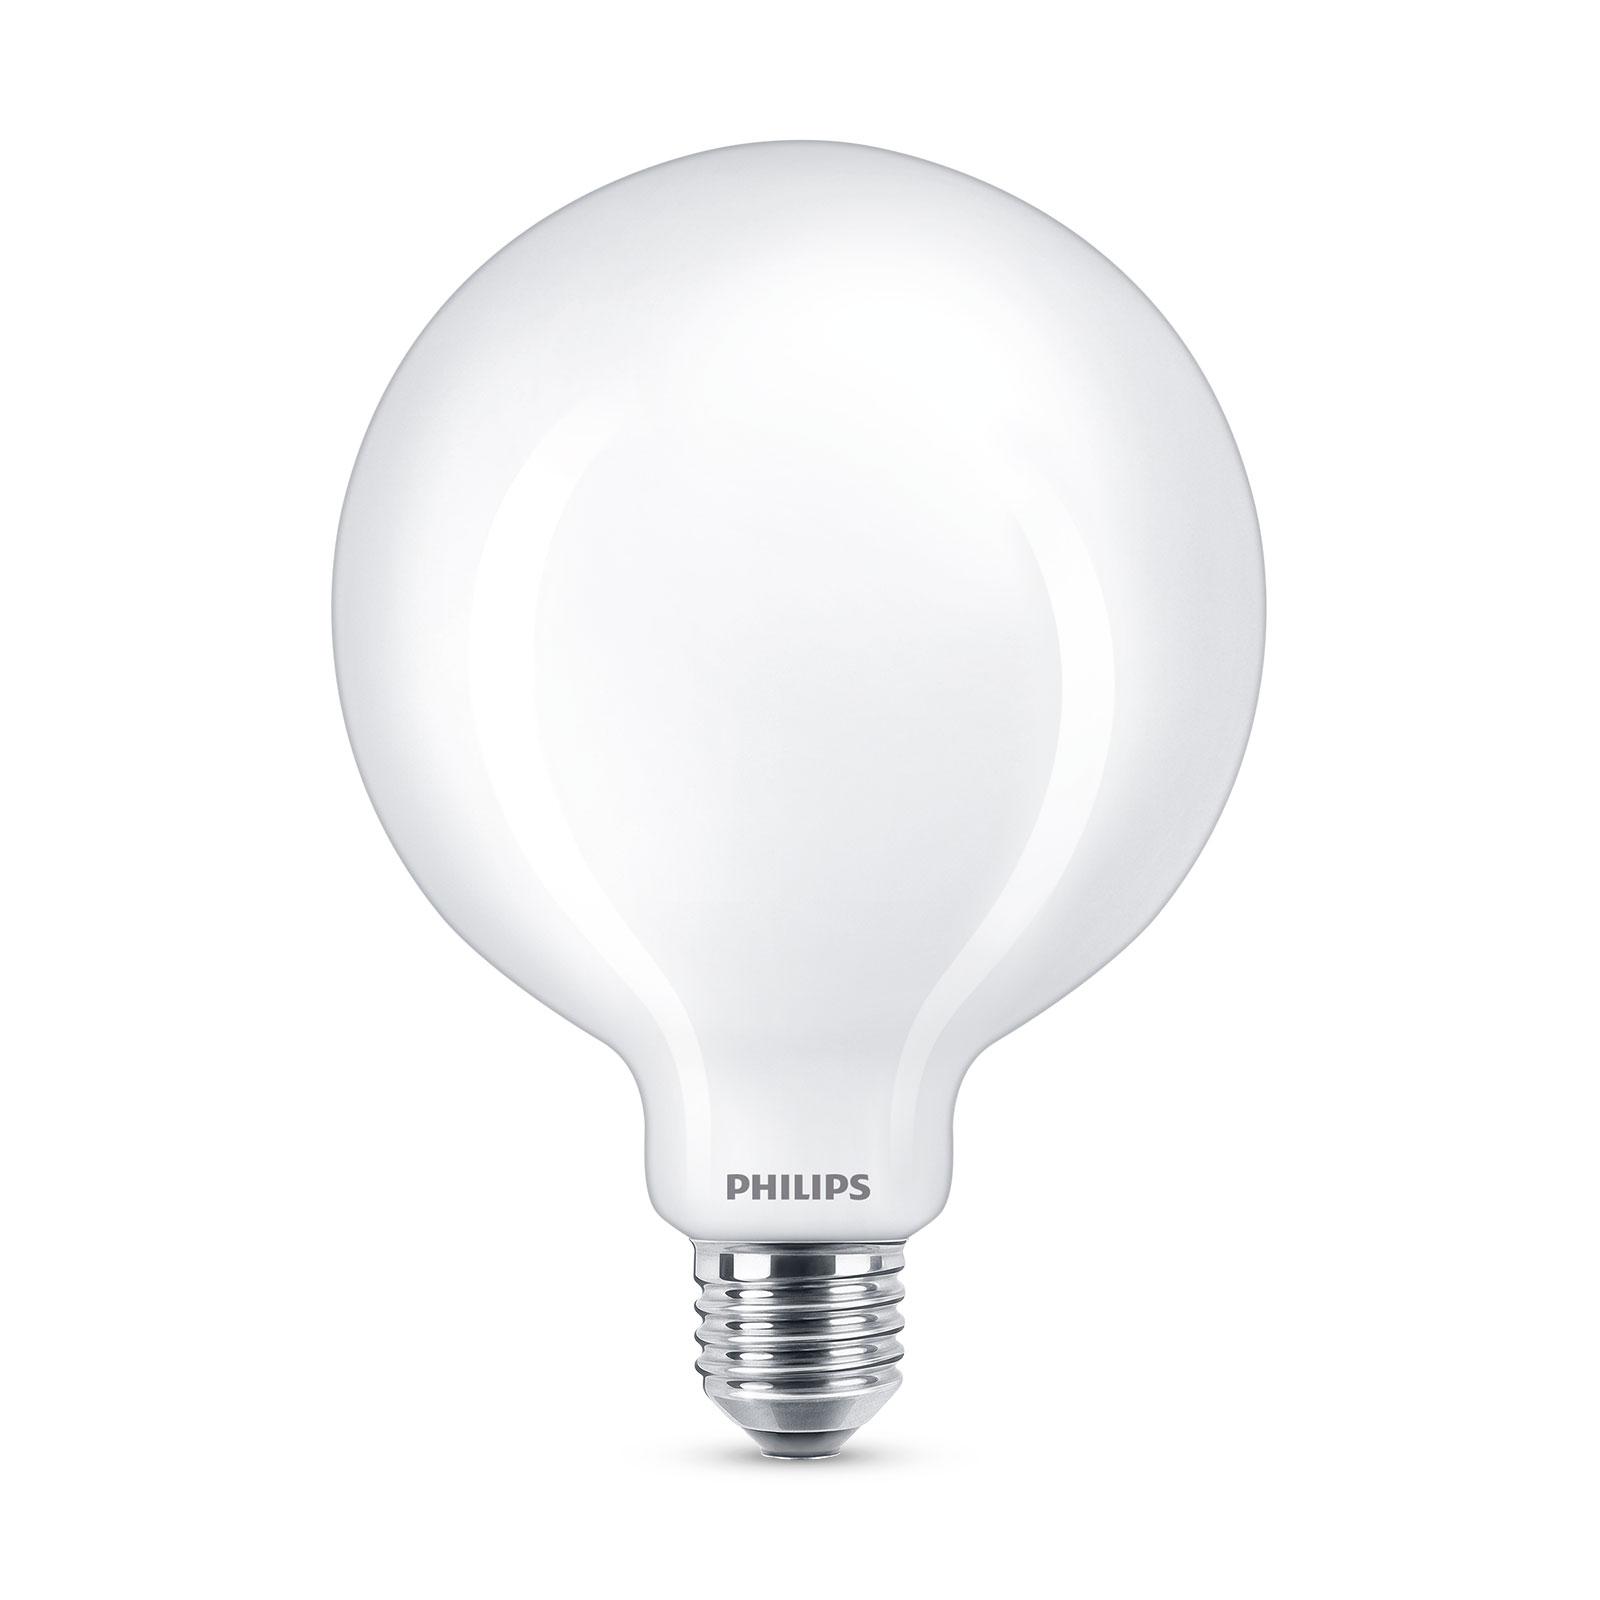 Philips Classic LED-Lampe E27 G120 7W matt 4.000K